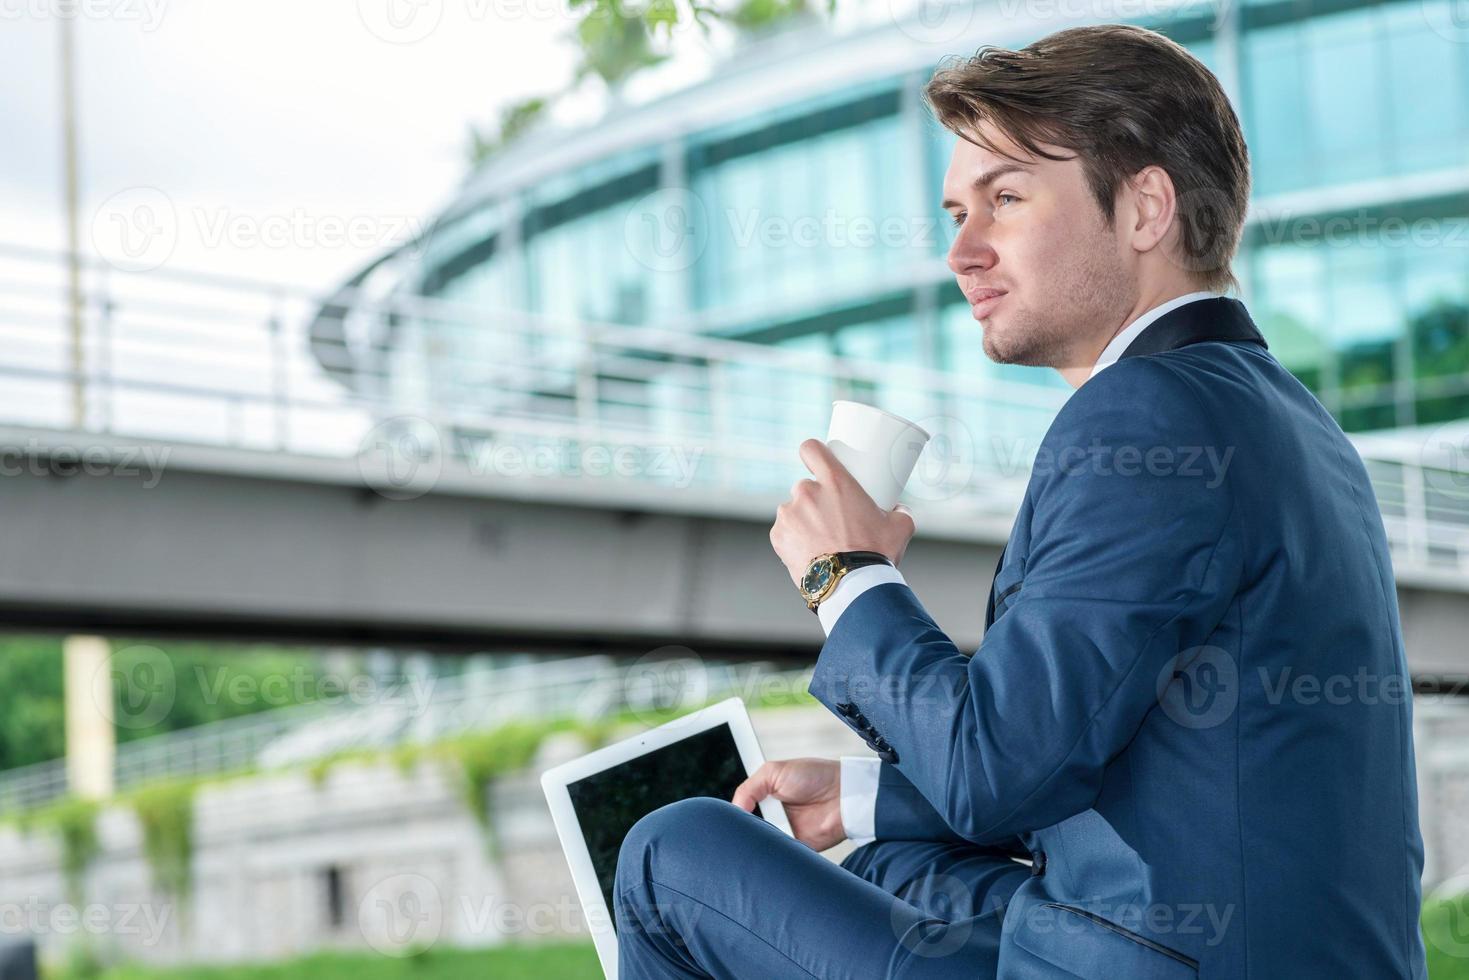 zakenman buiten zitten en koffie drinken en werken de foto